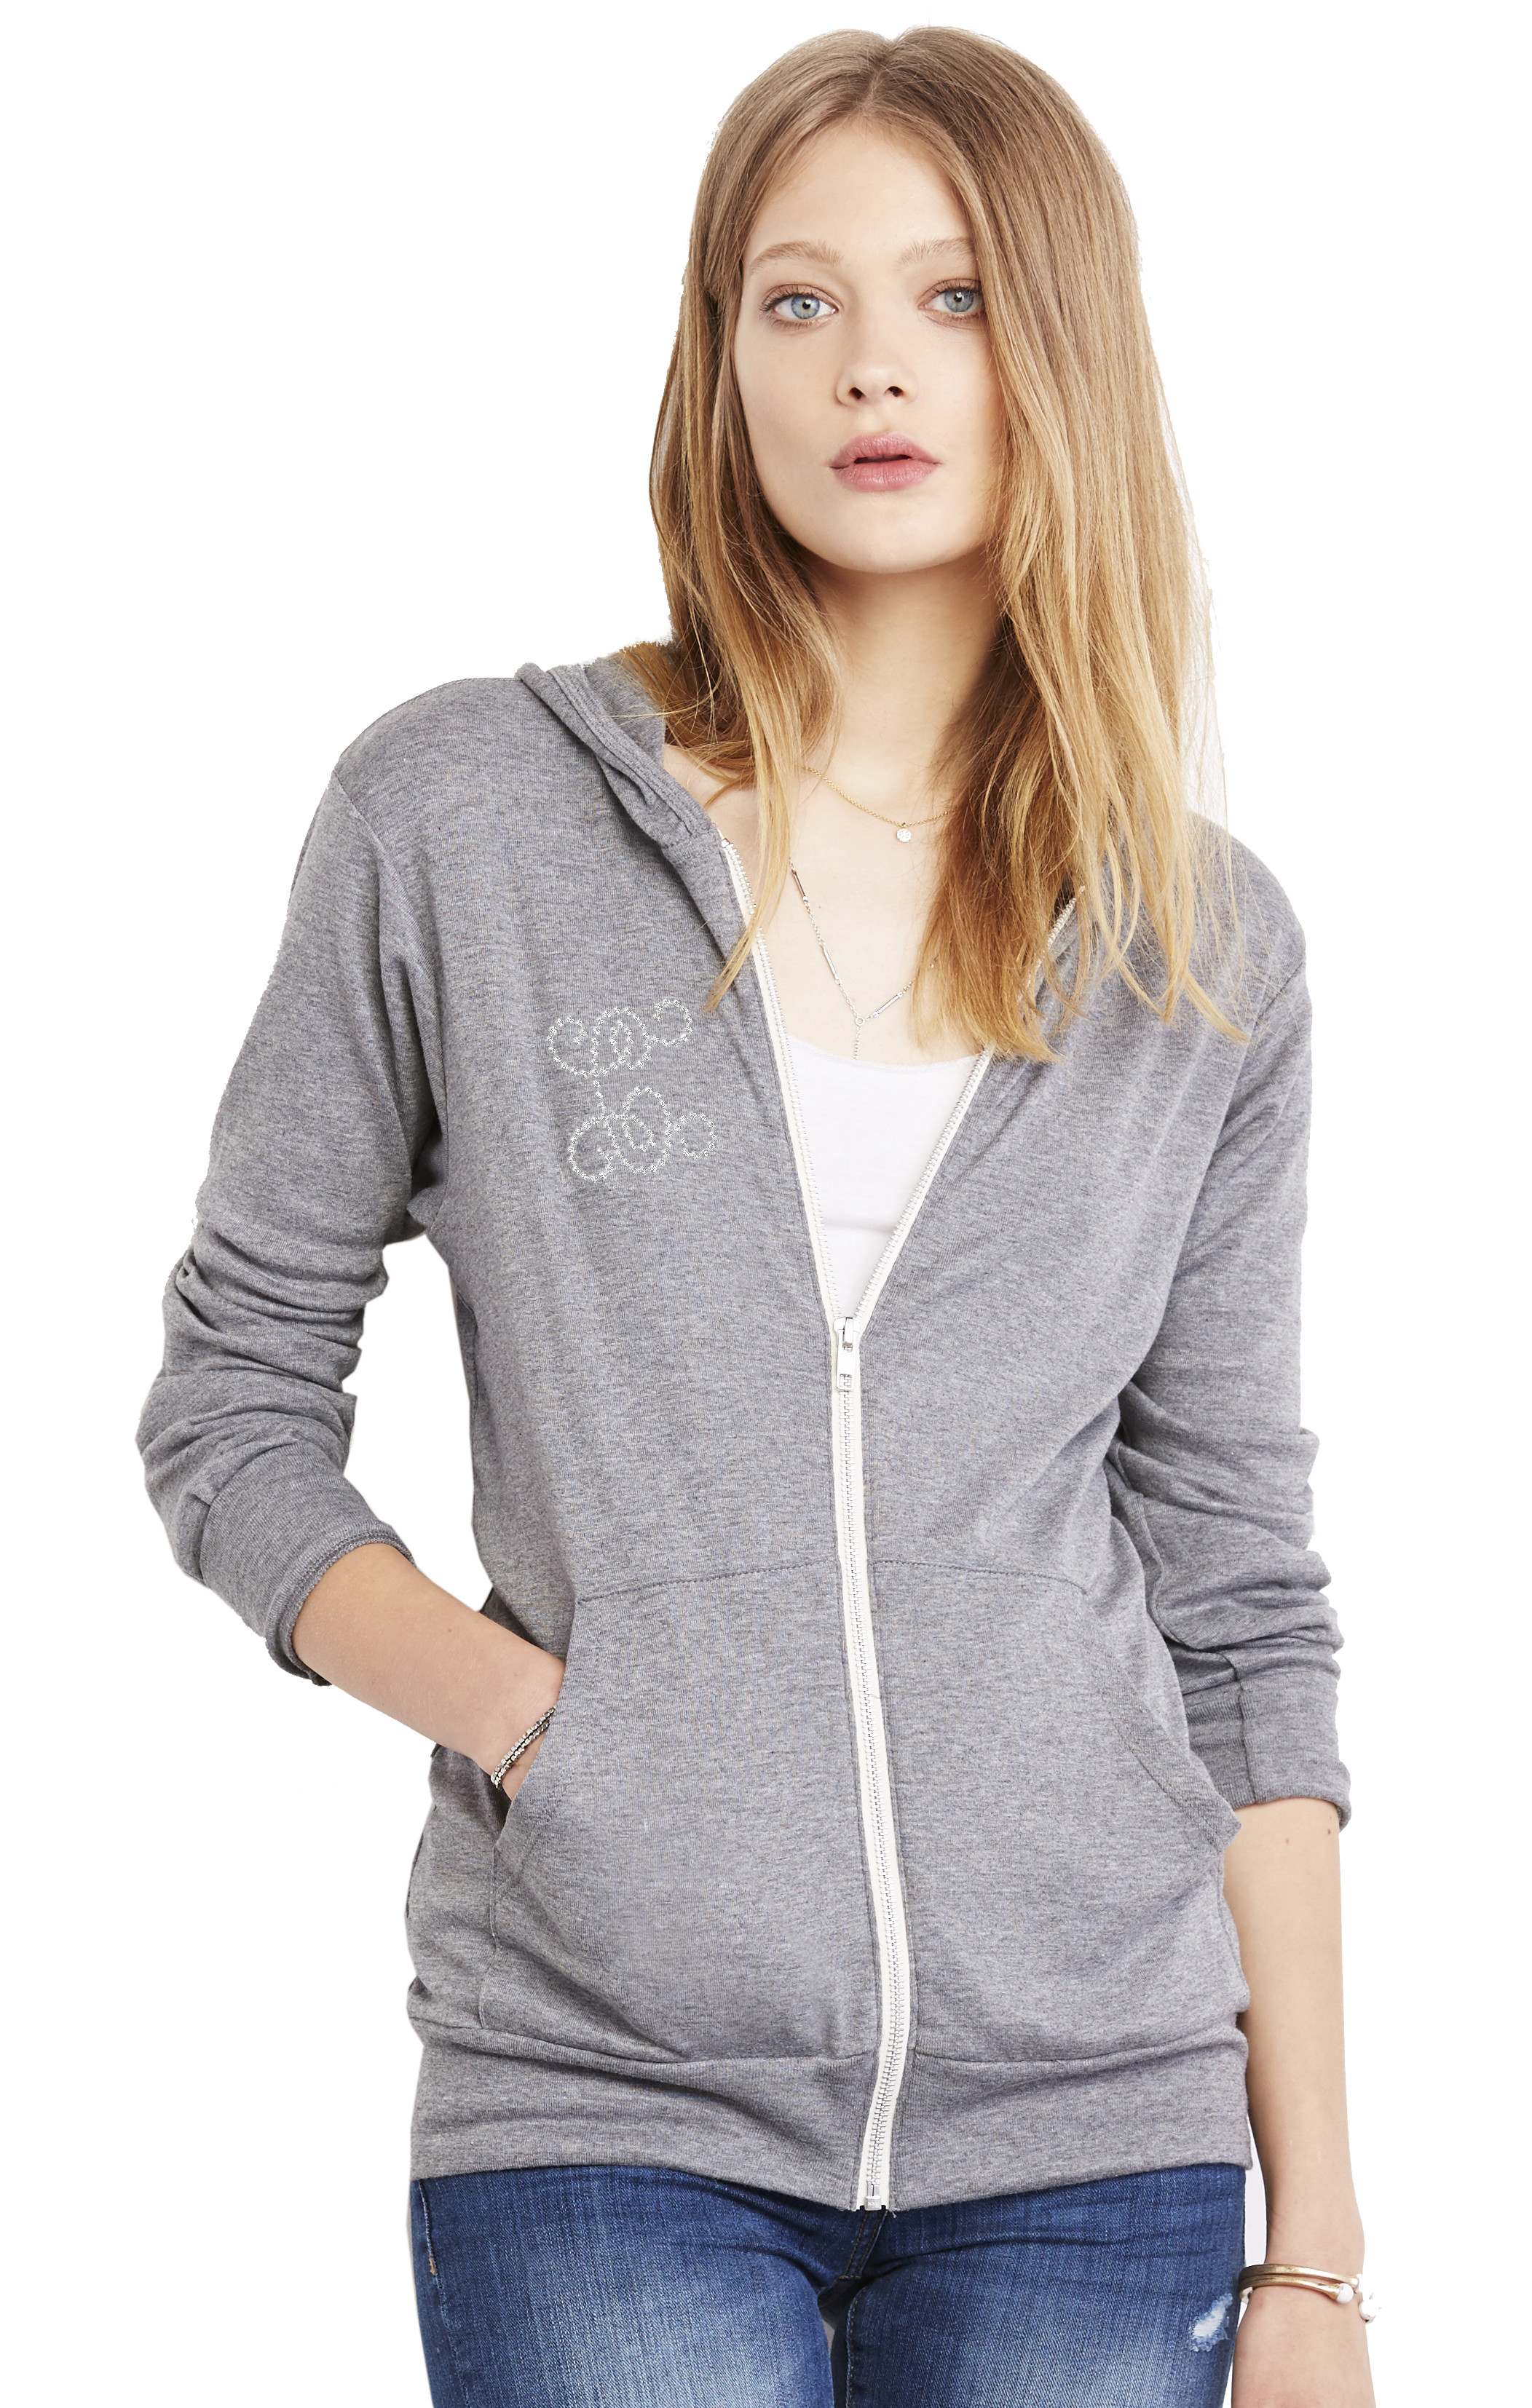 Unisex Grey Tri-Blend Full-Zip Lightweight Activewear Hoodie